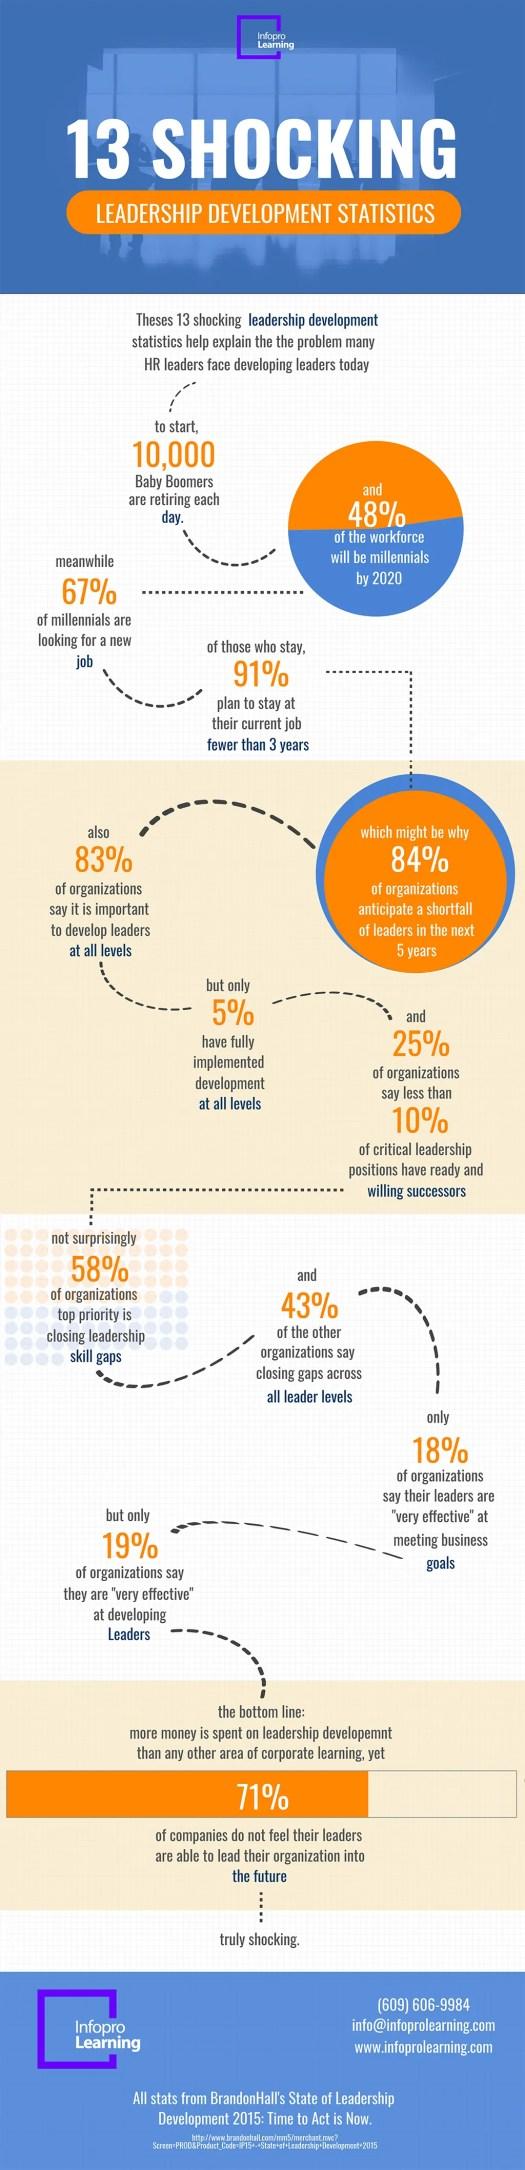 13 Shocking Leadership Development Statistics Infographic